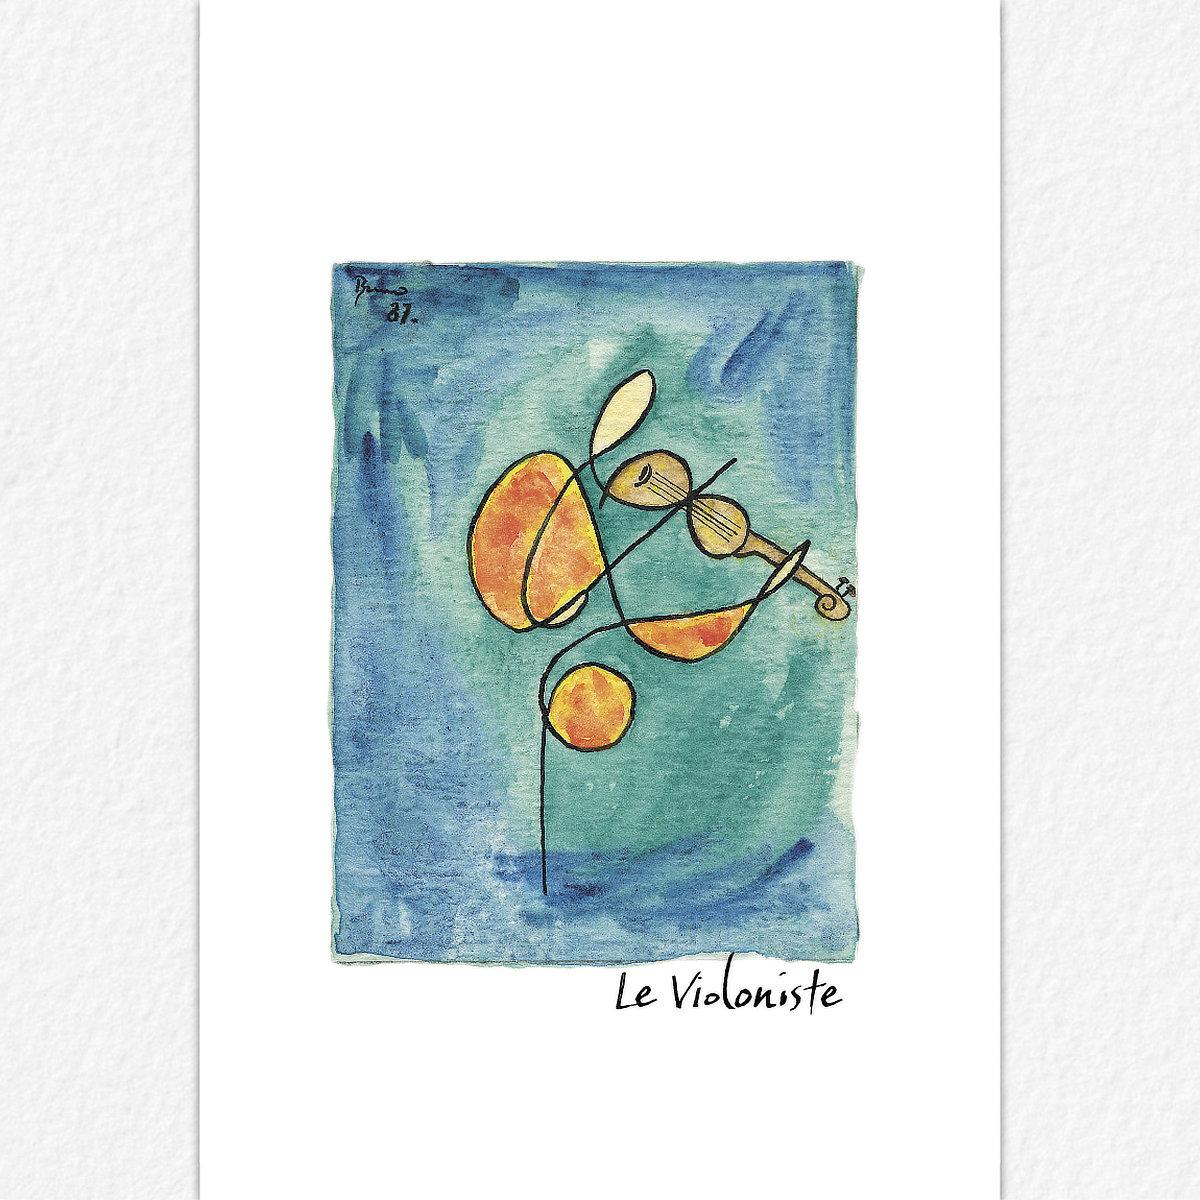 Le Violoniste - carte postale